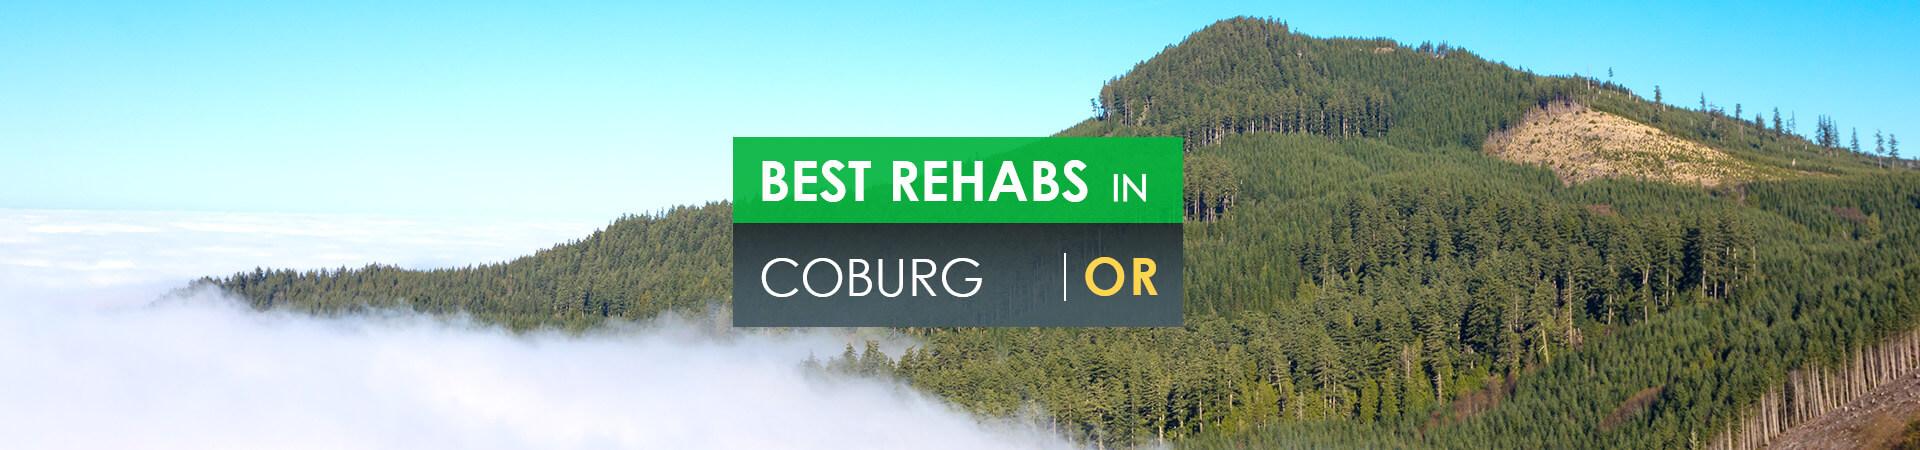 Best rehabs in Coburg, OR